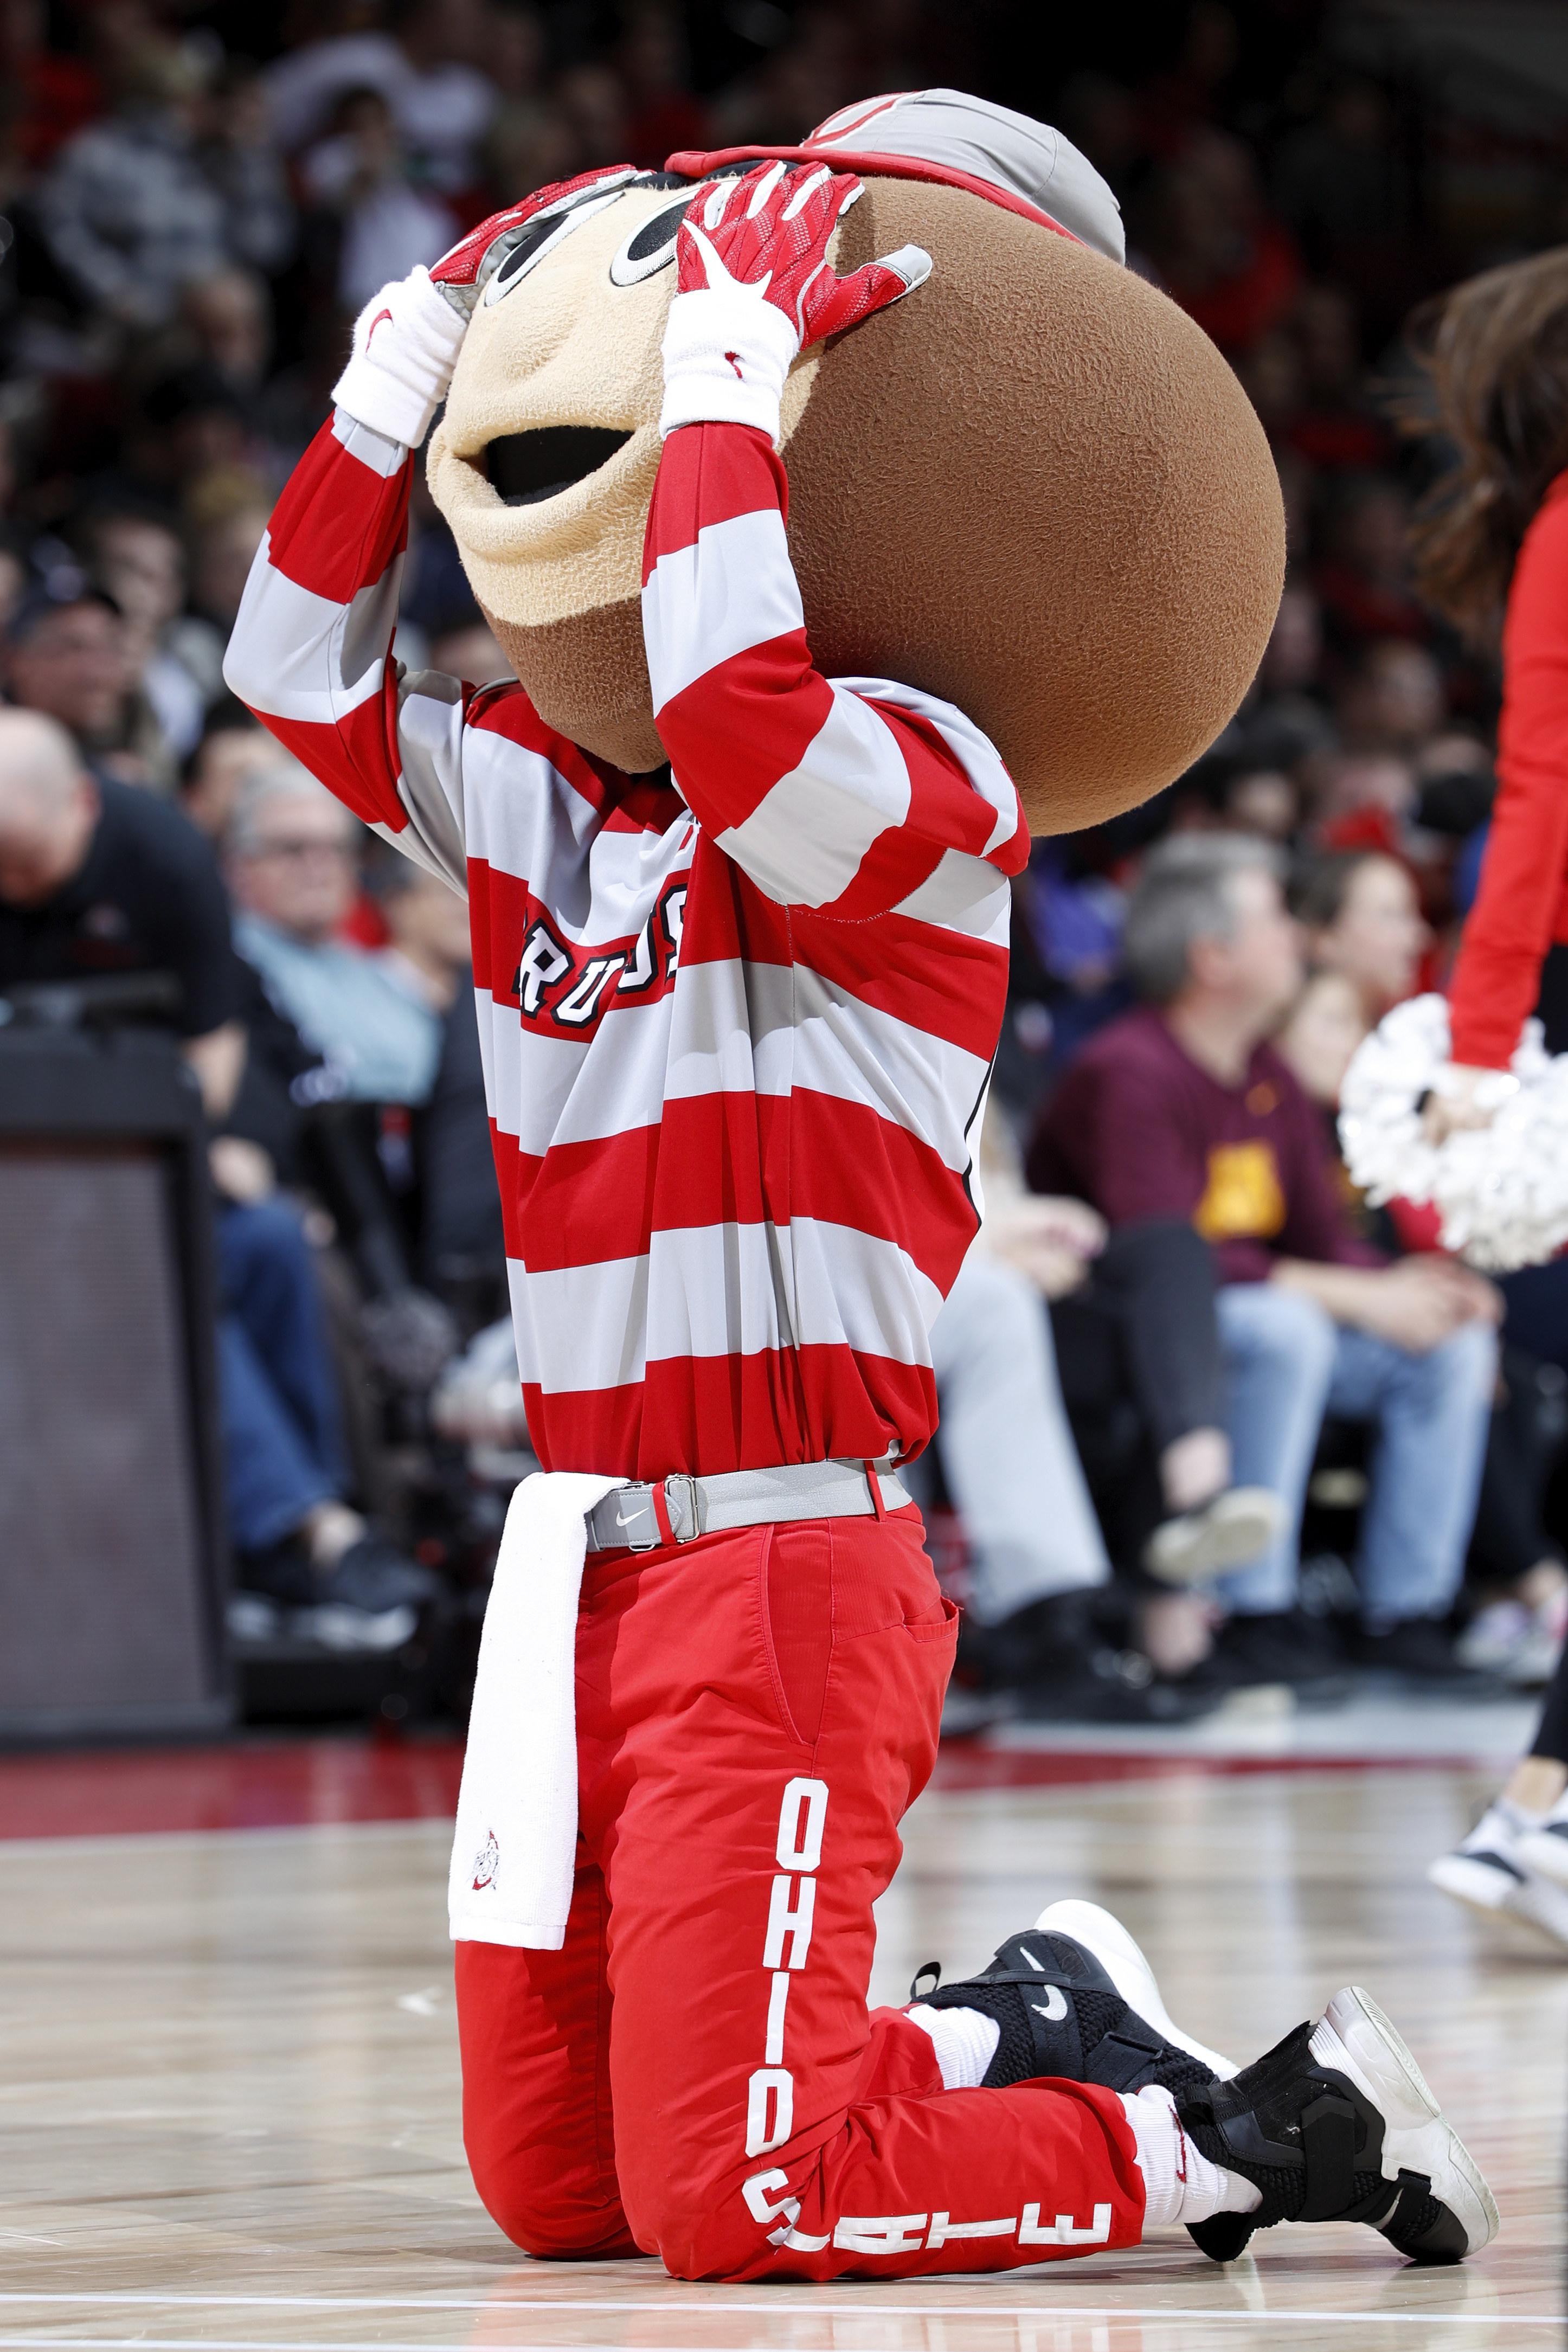 Brutus the mascot, a buckeye-head wearing a little hat, in red sweats